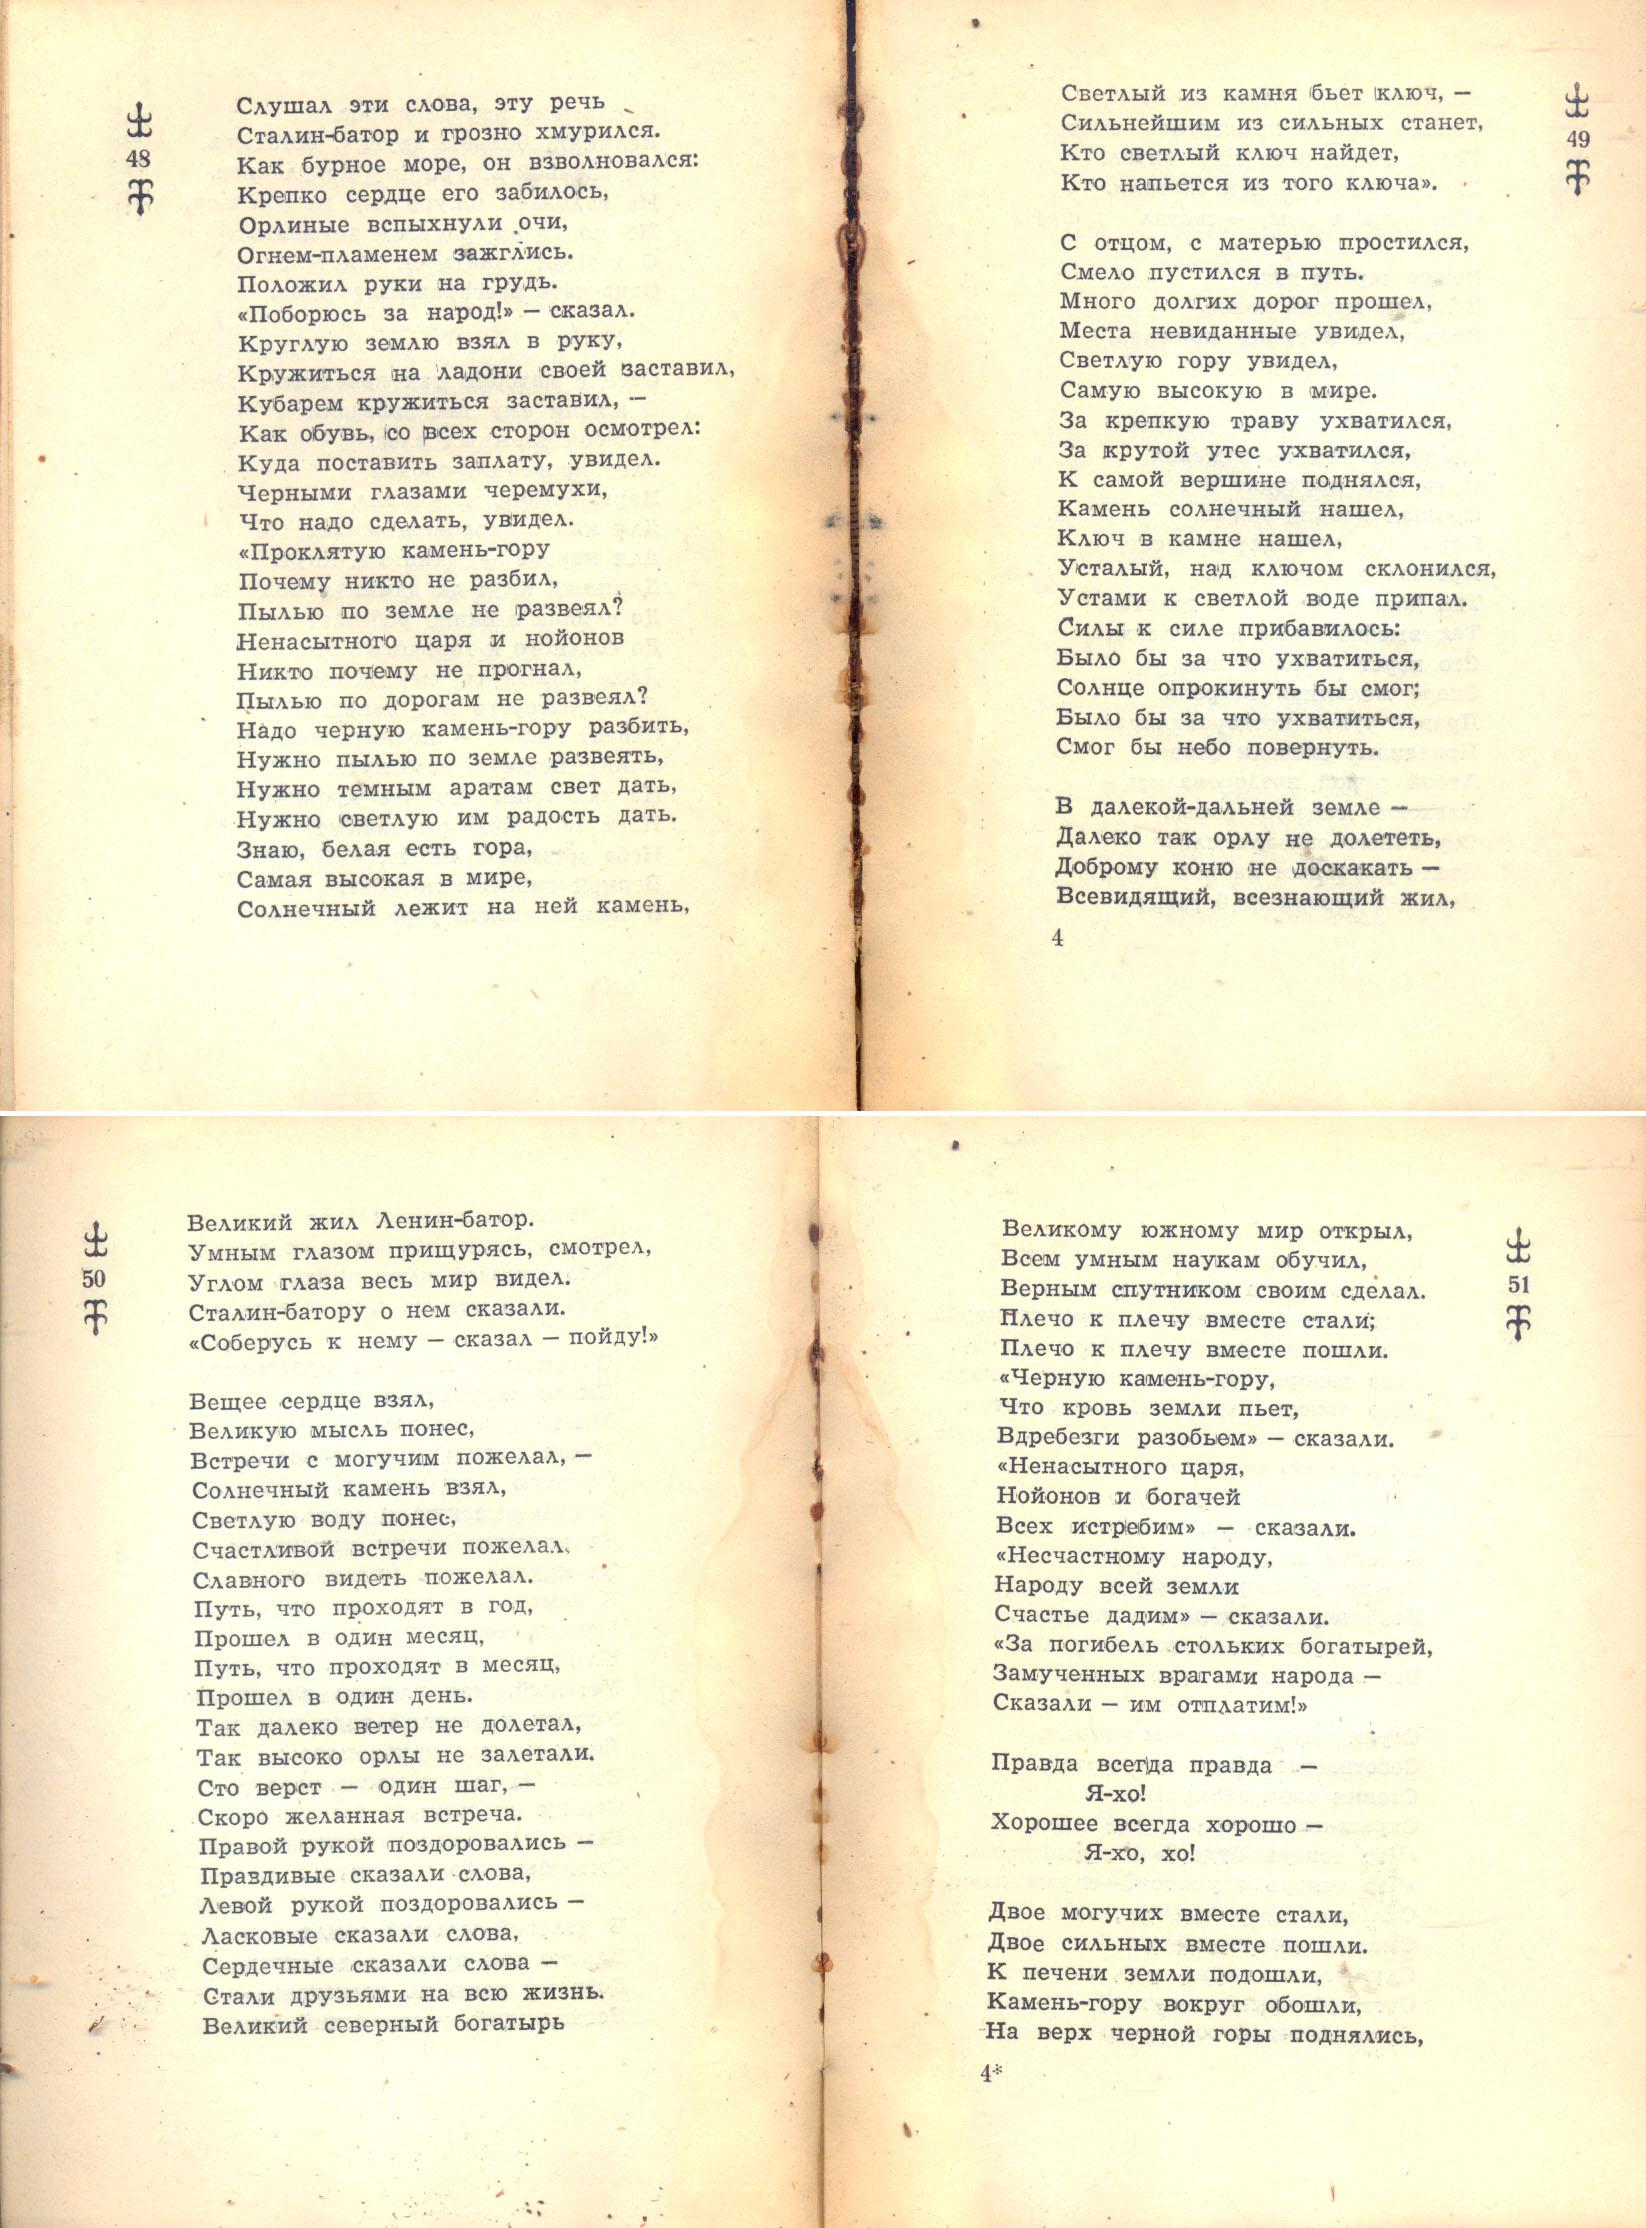 Песни 48-51.jpg